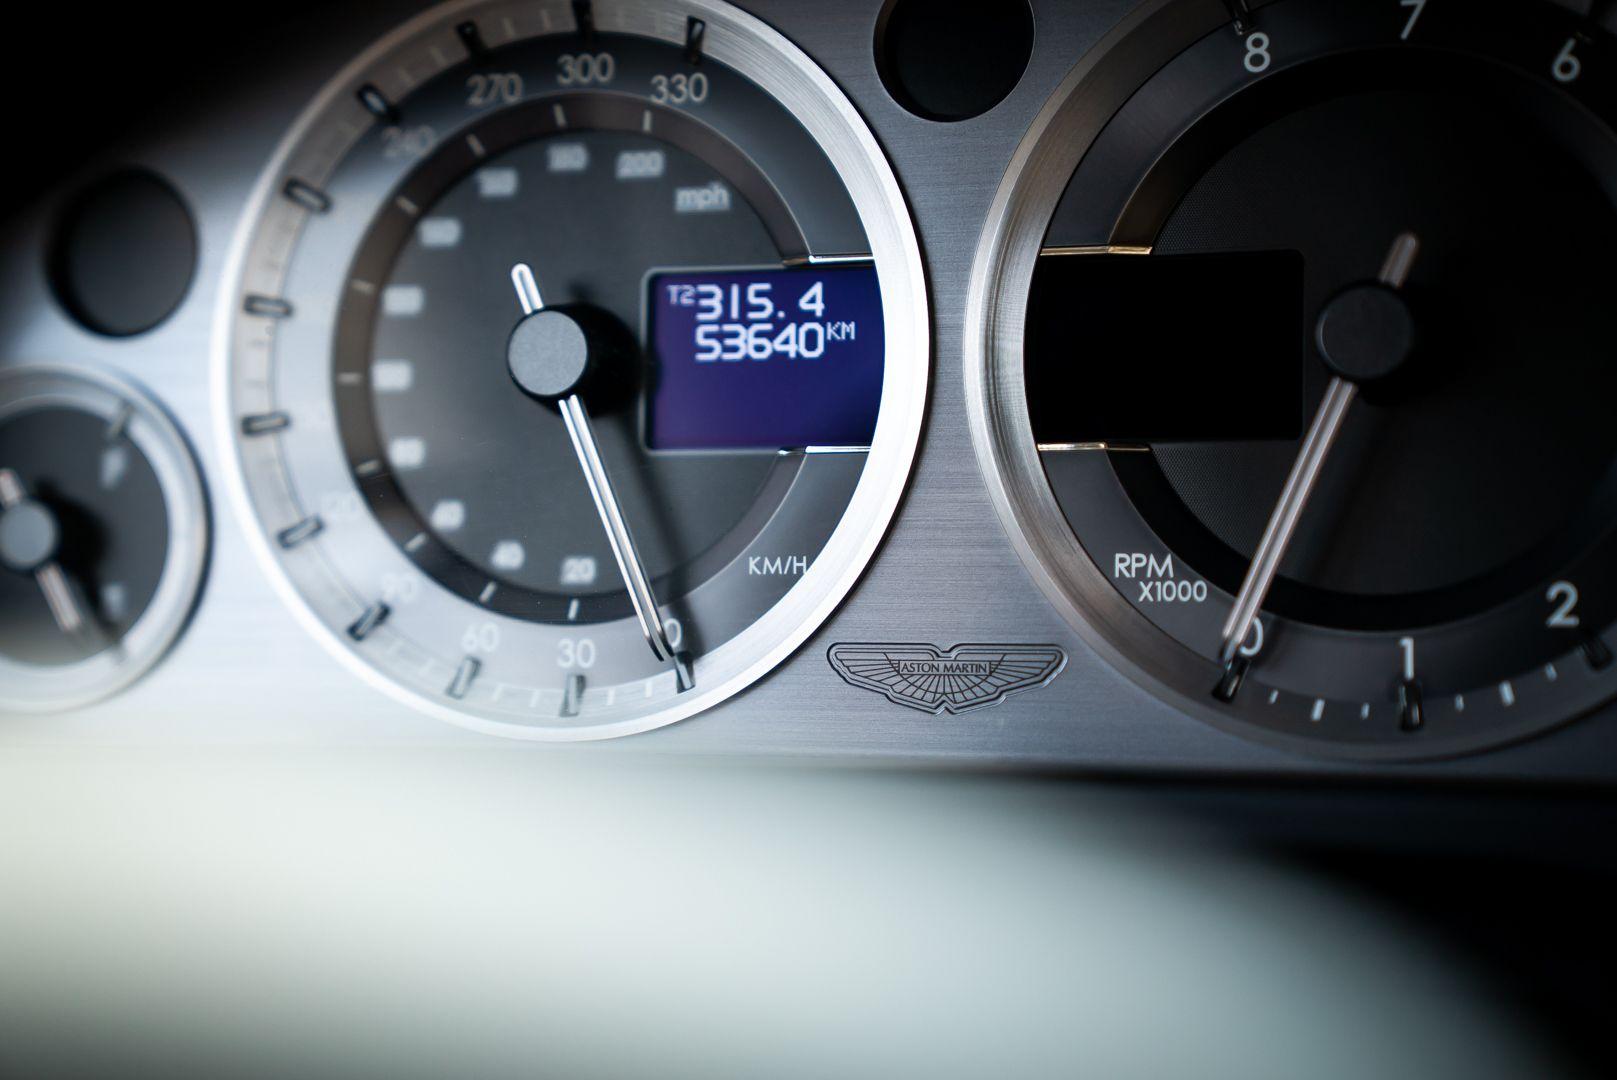 2008 Aston Martin 4.3 V8 Vantage Roadster N400 82815